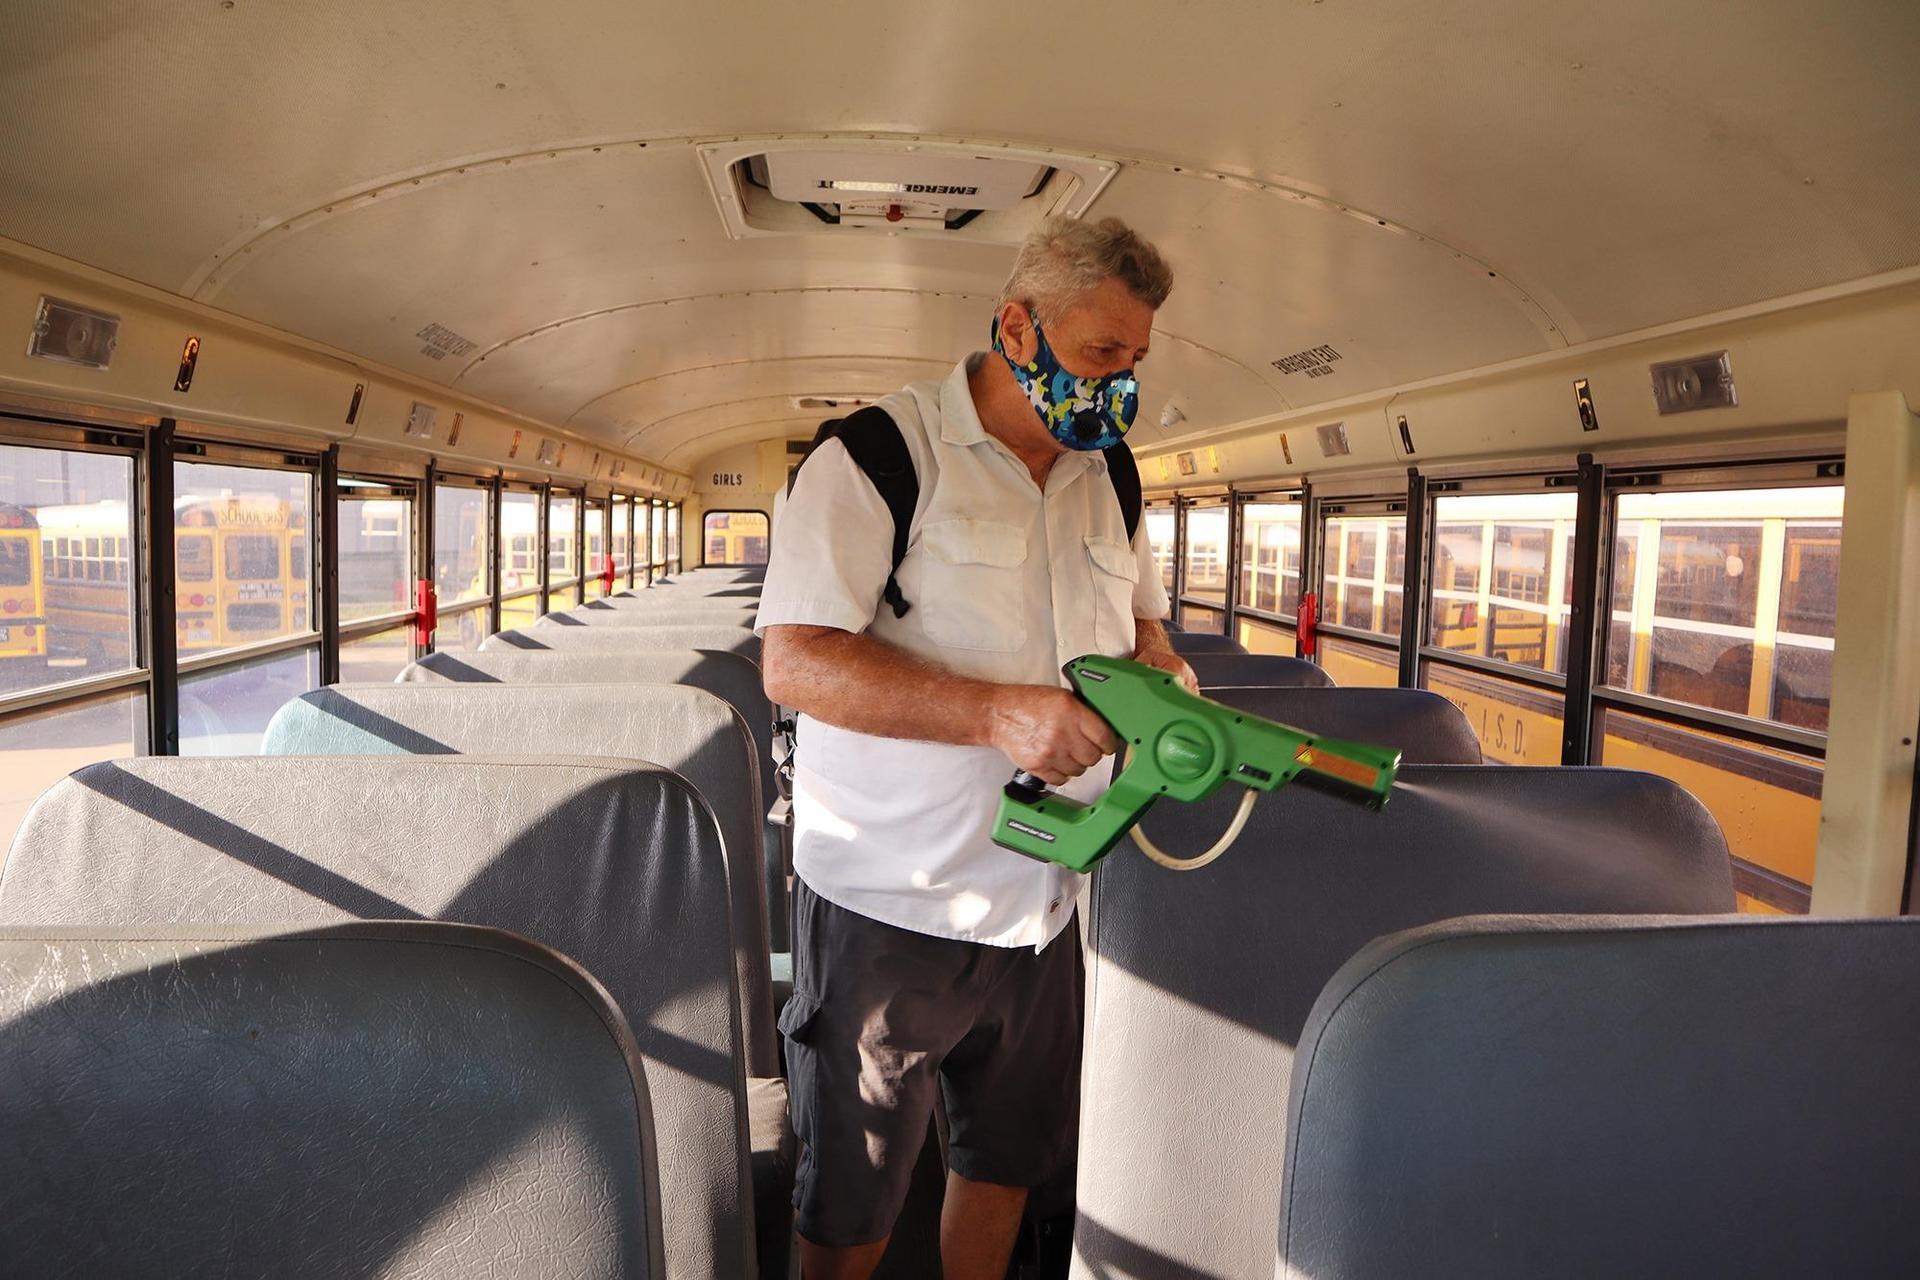 man sanitizing school bus seats